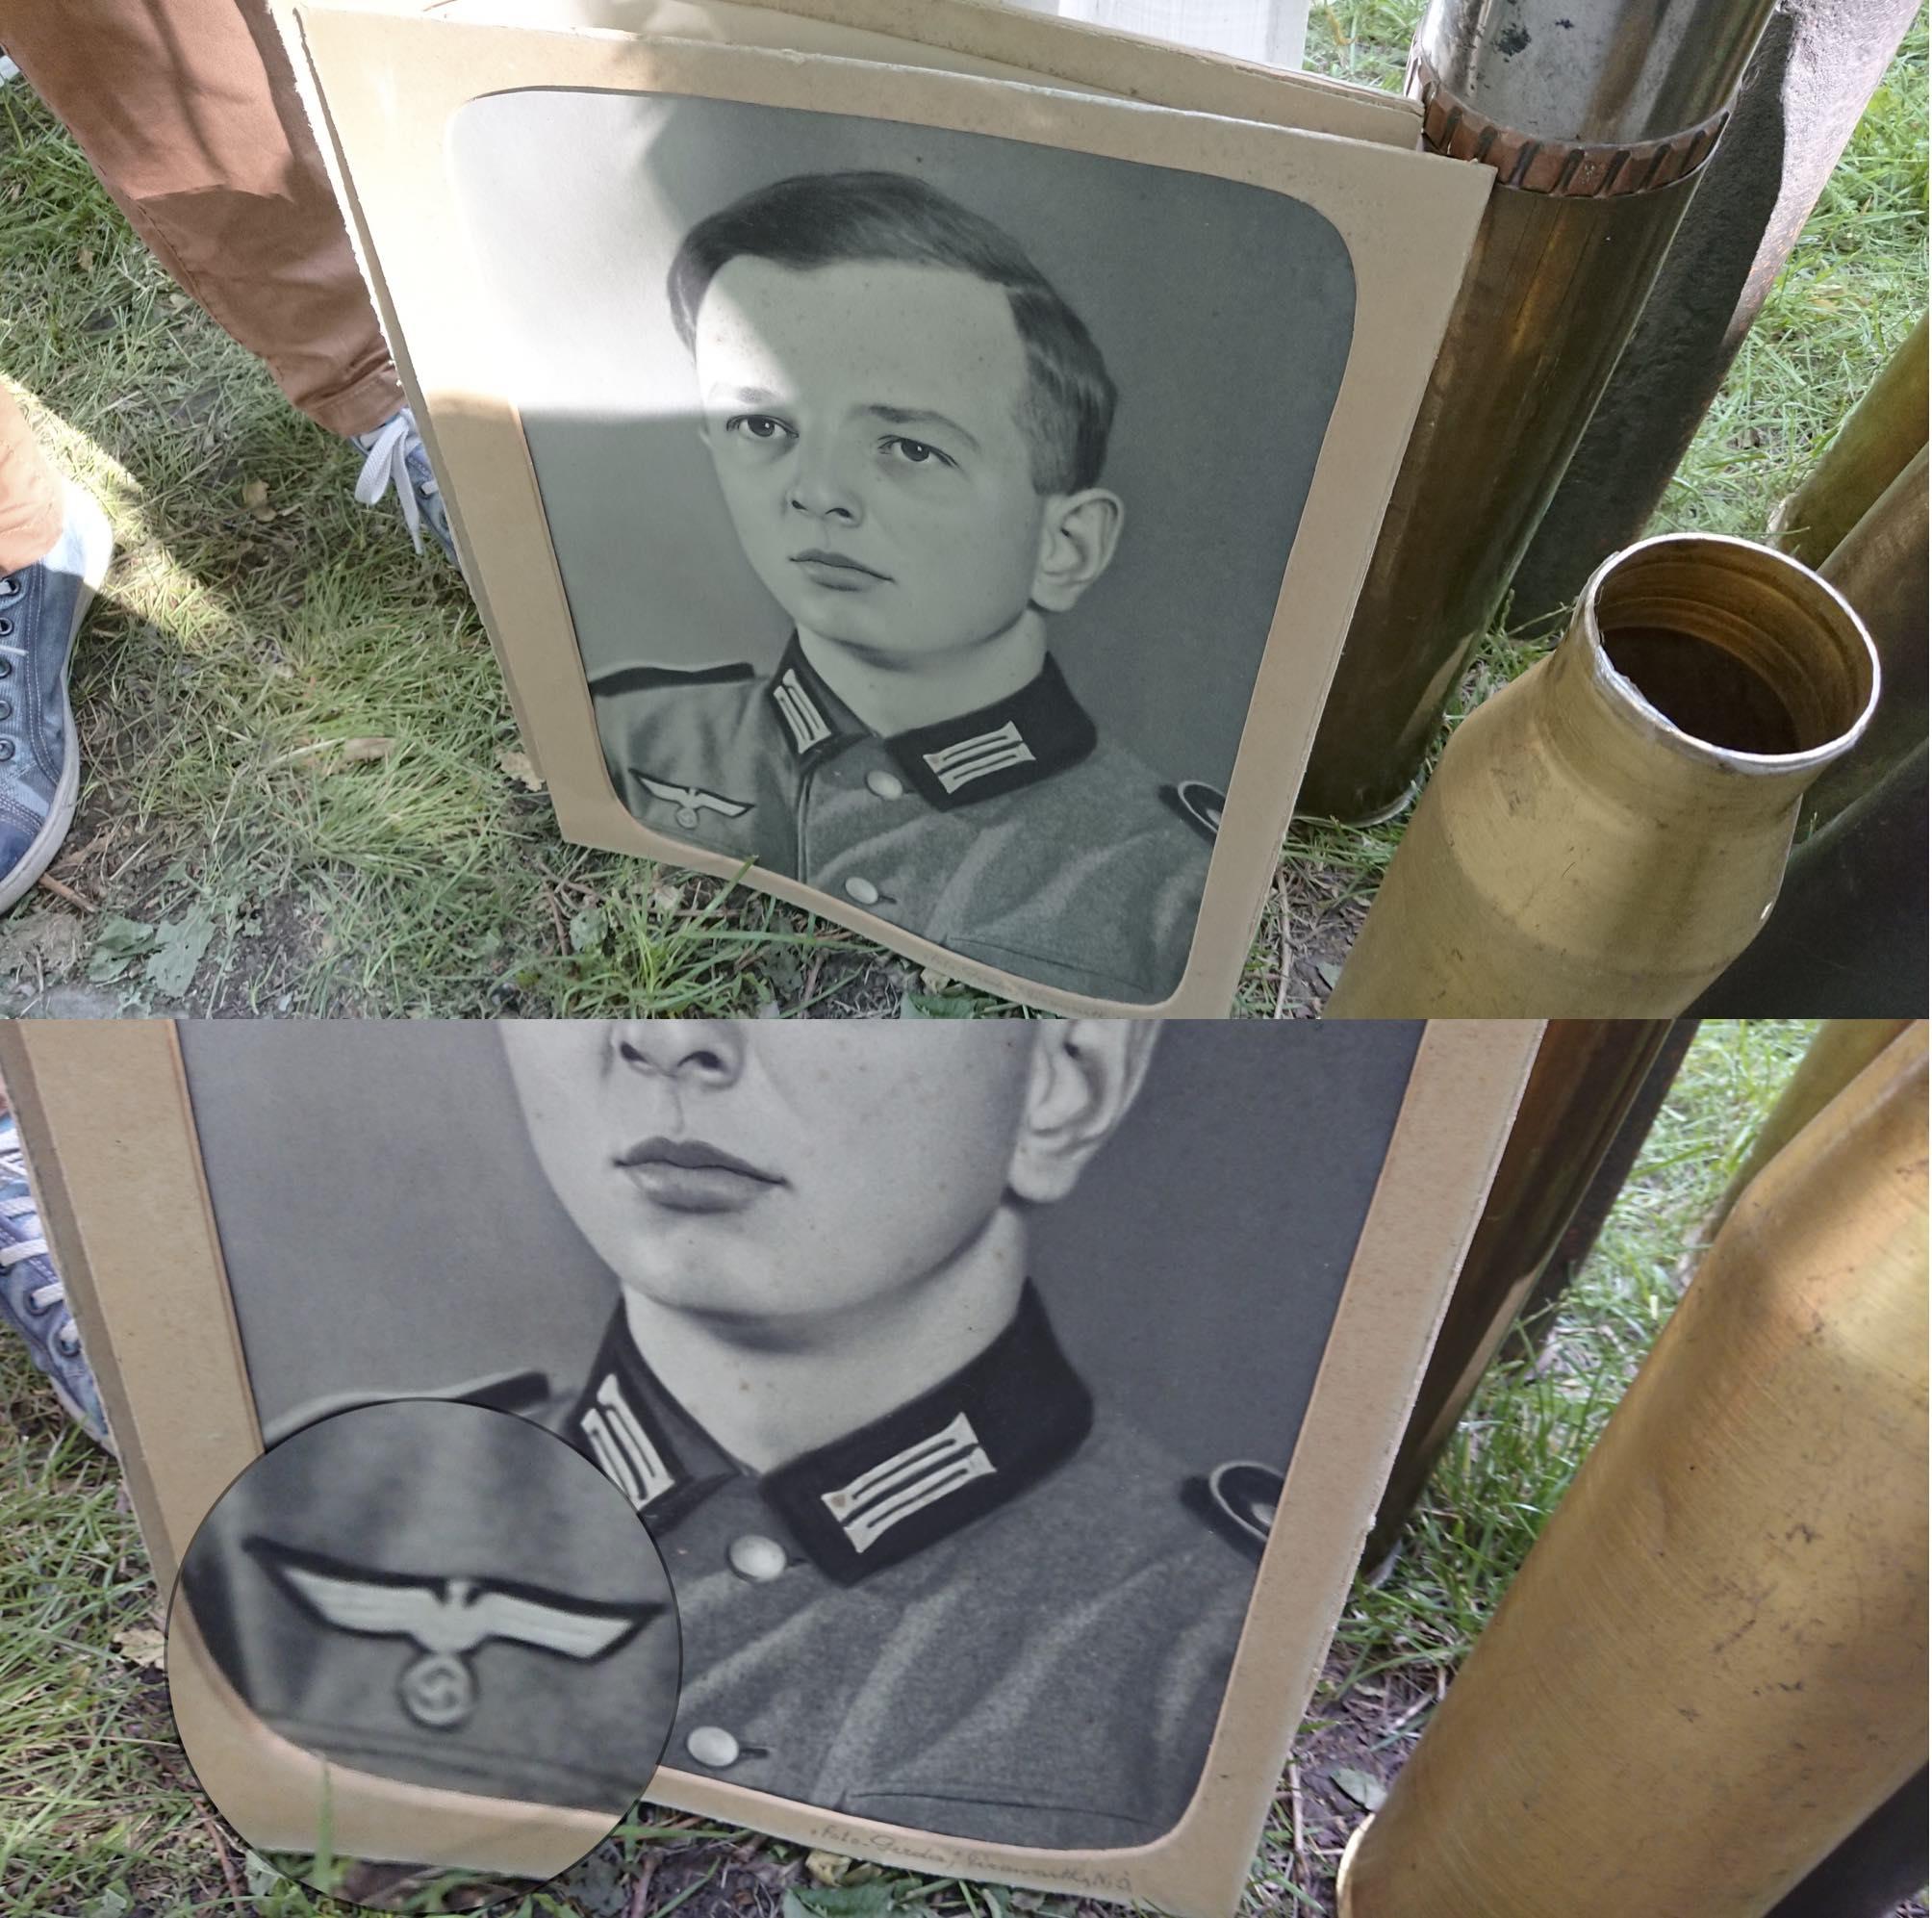 NS-Uniform mit Hakenkreuz (© SdR)